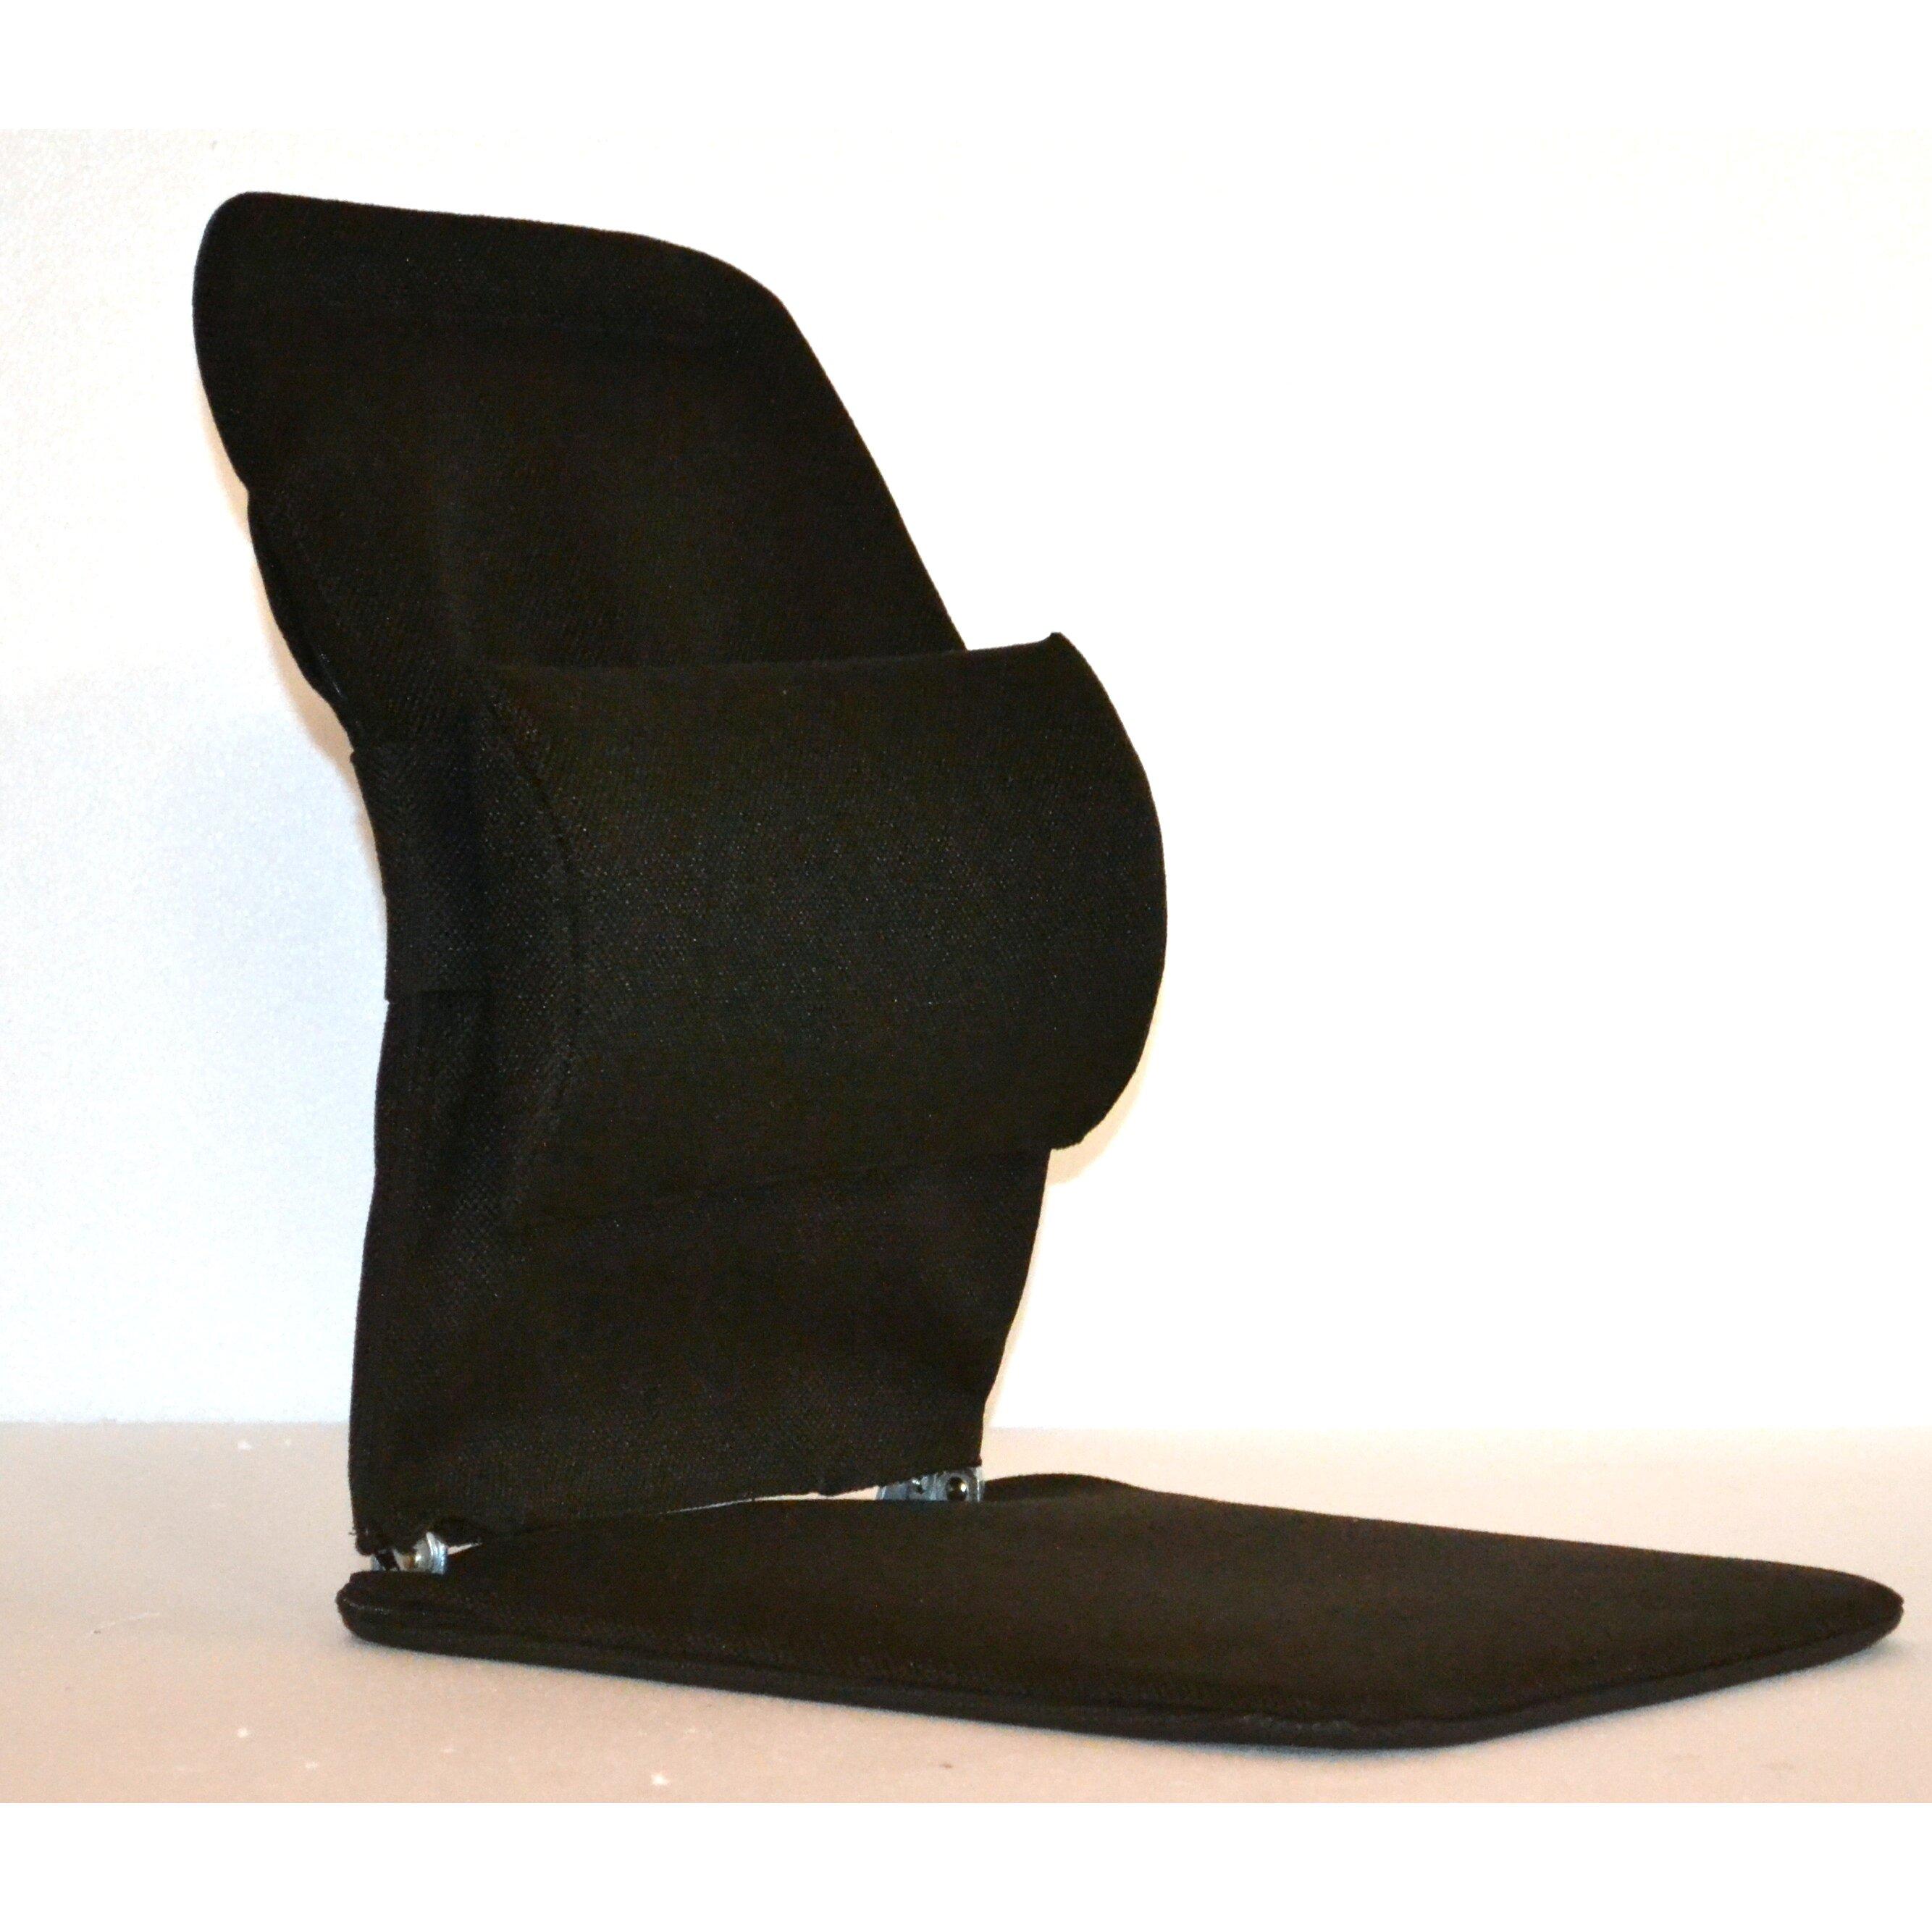 sacro ease seat back cushion with adjustable lumbar